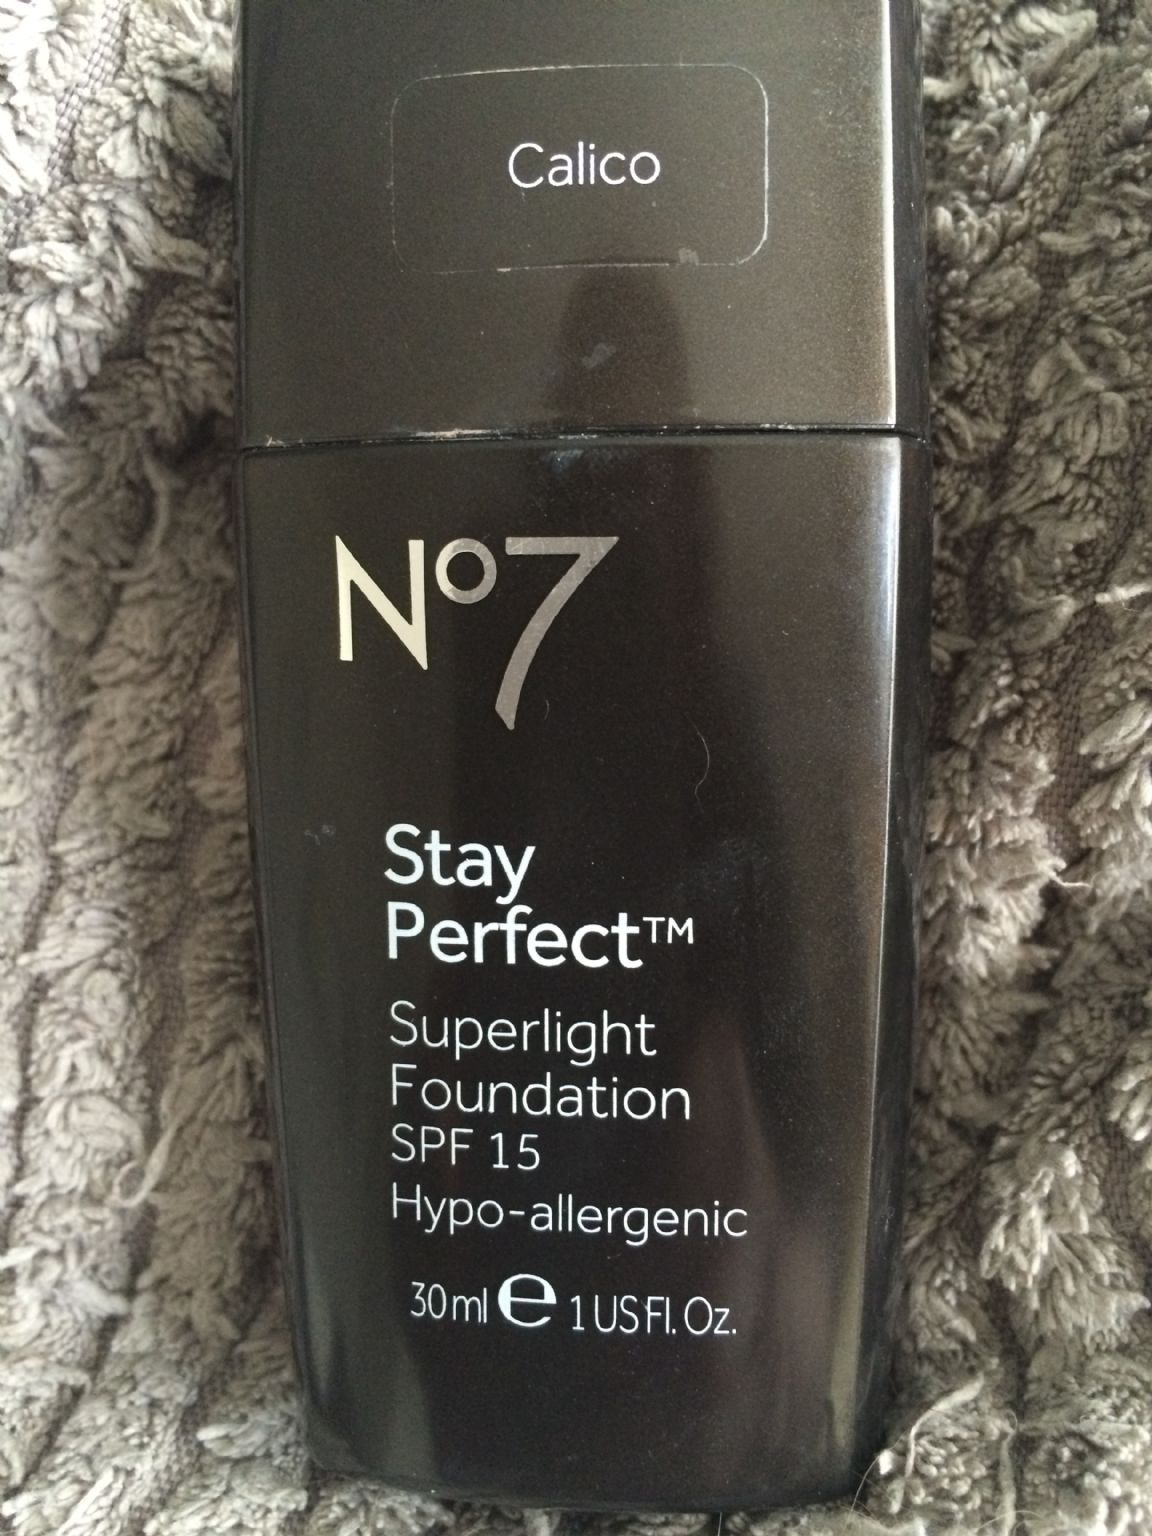 No7 Stay Perfect Superlight Foundation SPF15